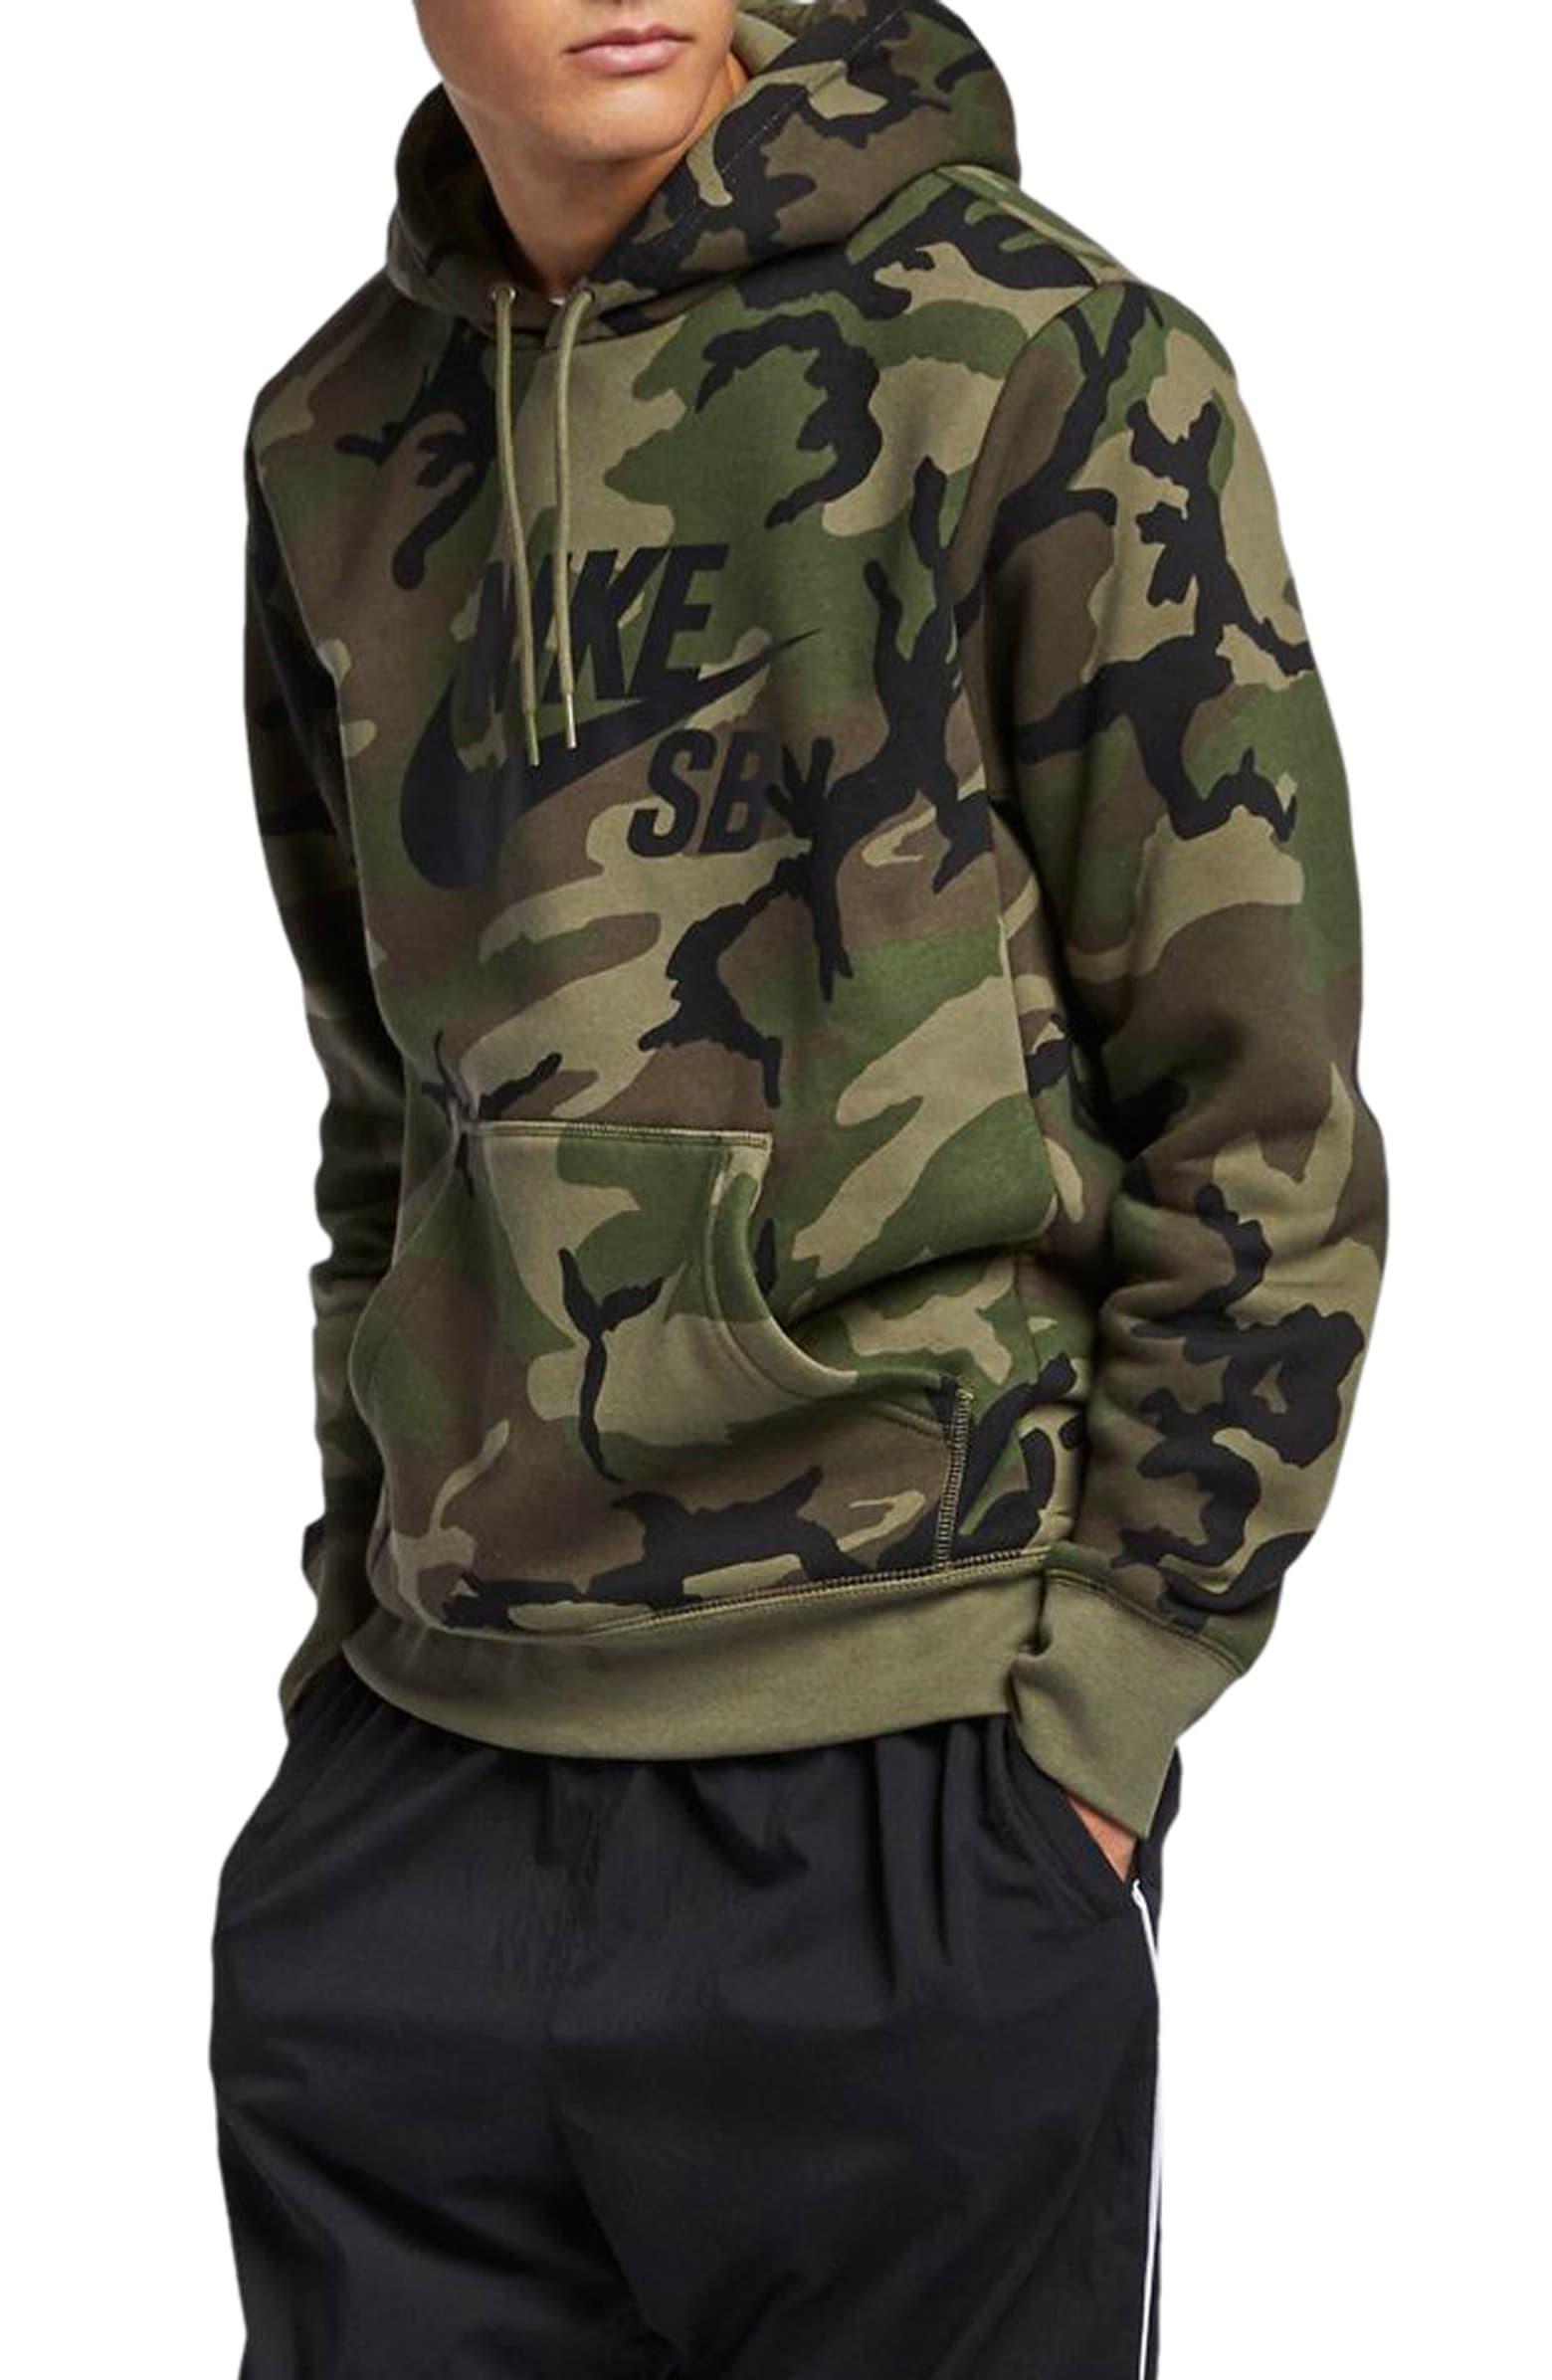 Nike Icon Camo Hoodie